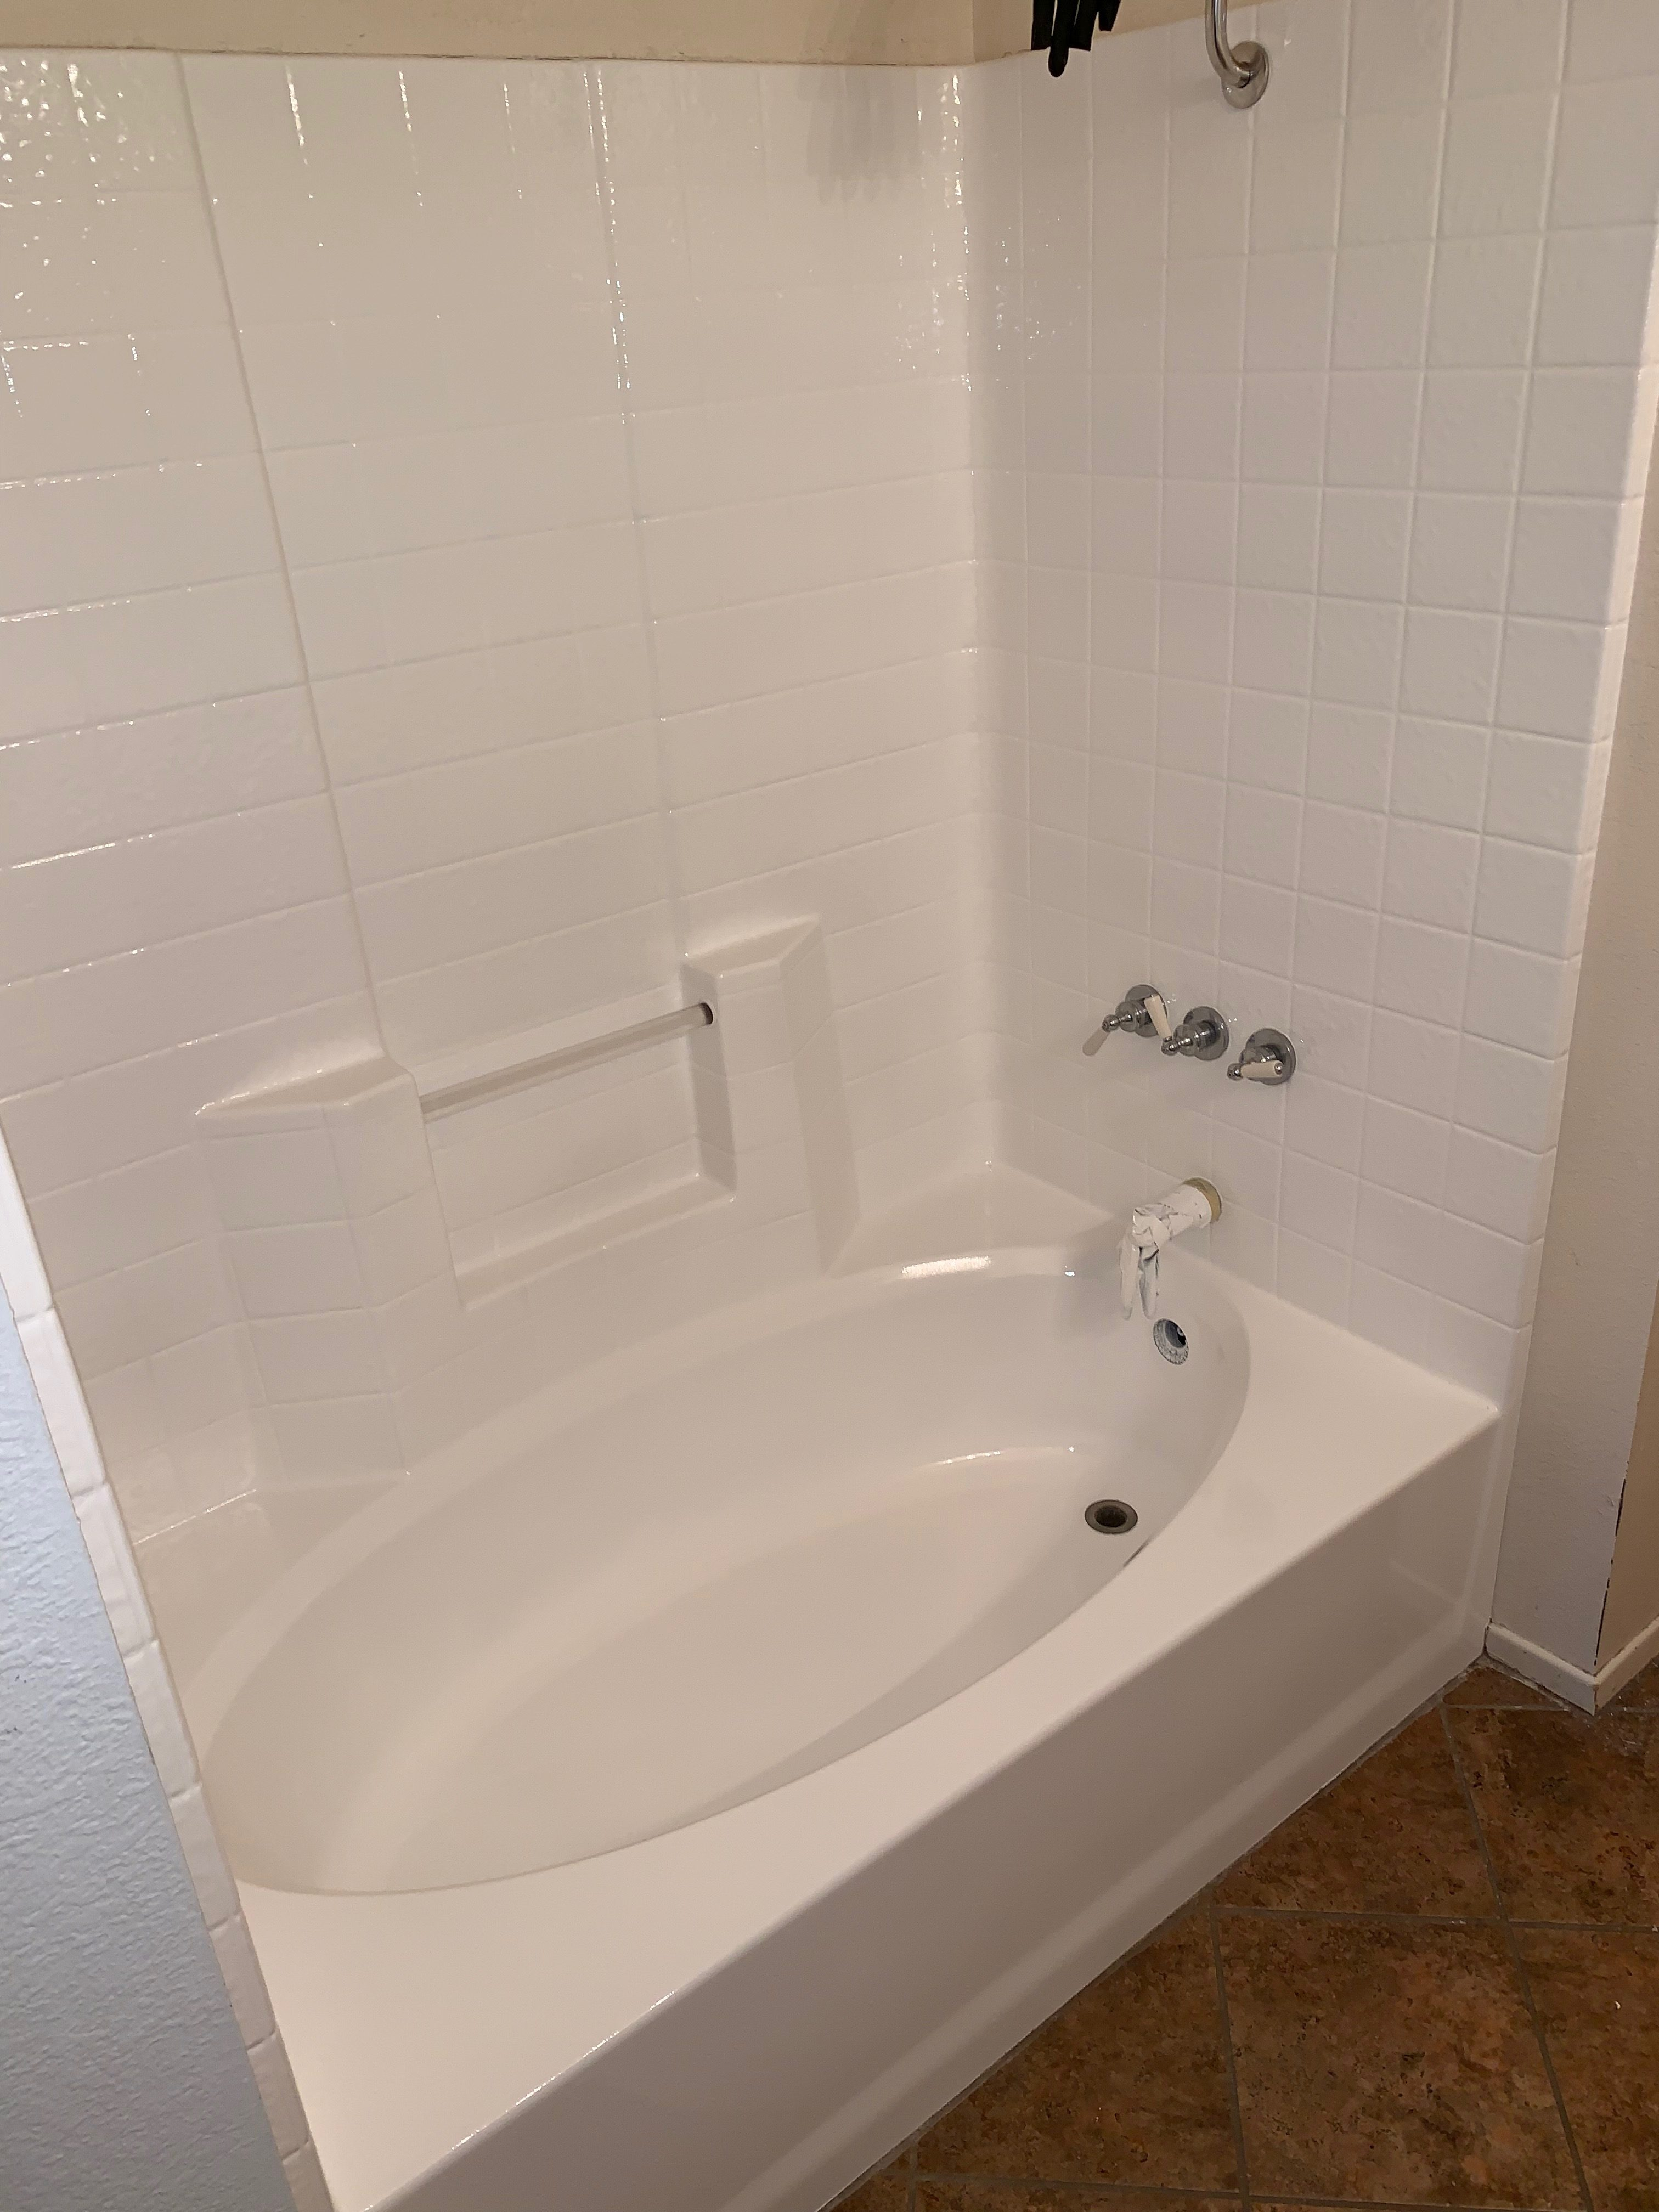 Bathtub Resurfacing And Tile Resurfacing After - NuFinishPro